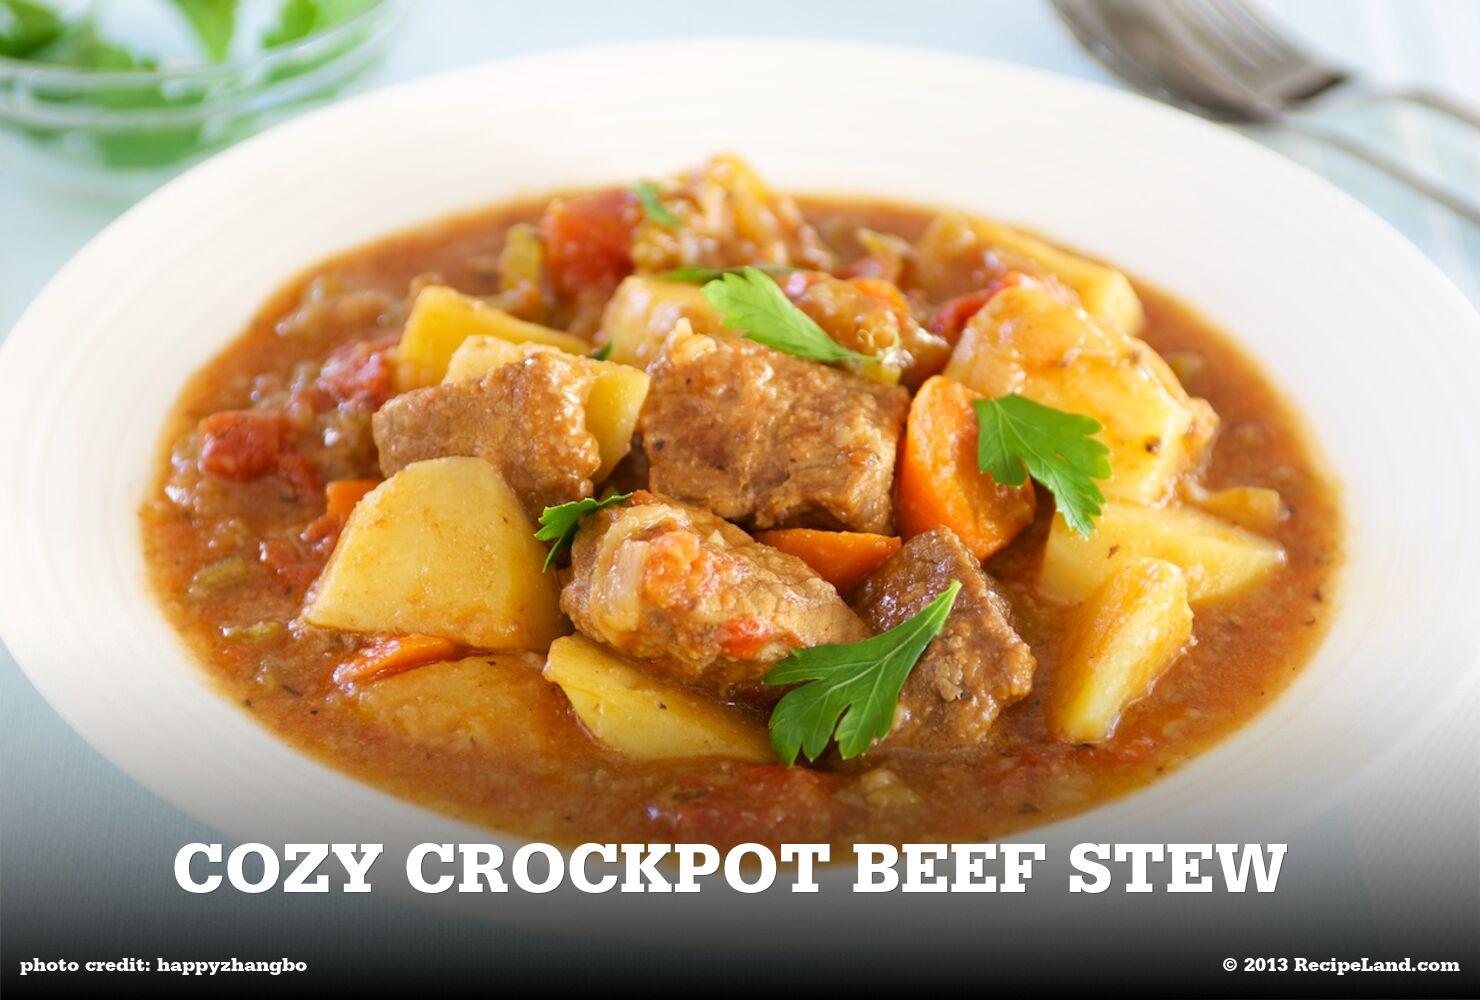 Cozy Crockpot Beef Stew